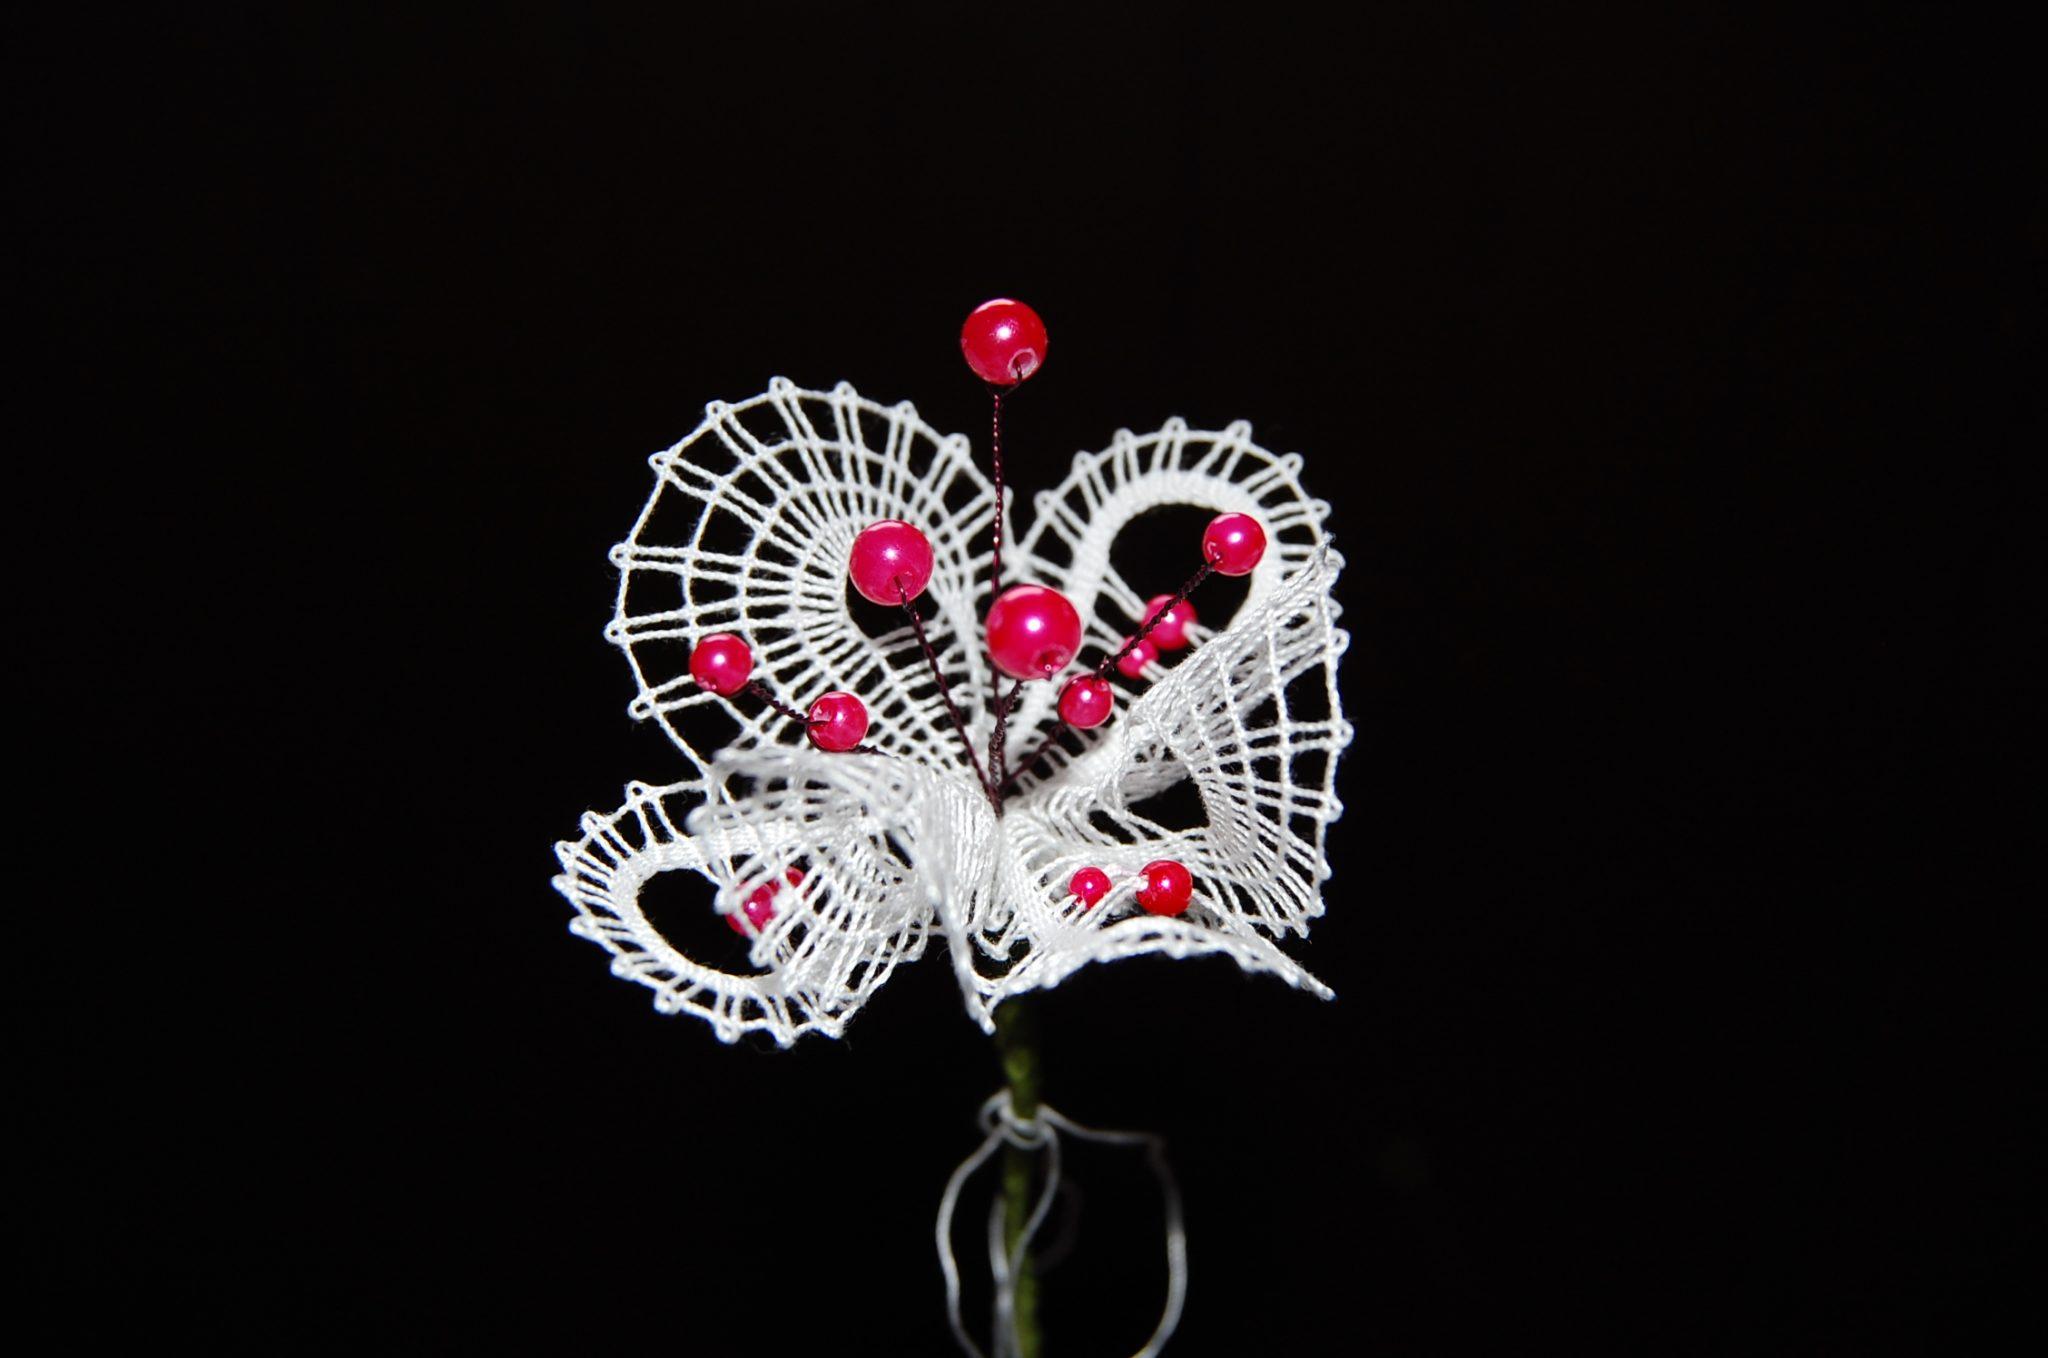 čipka rože s steblom